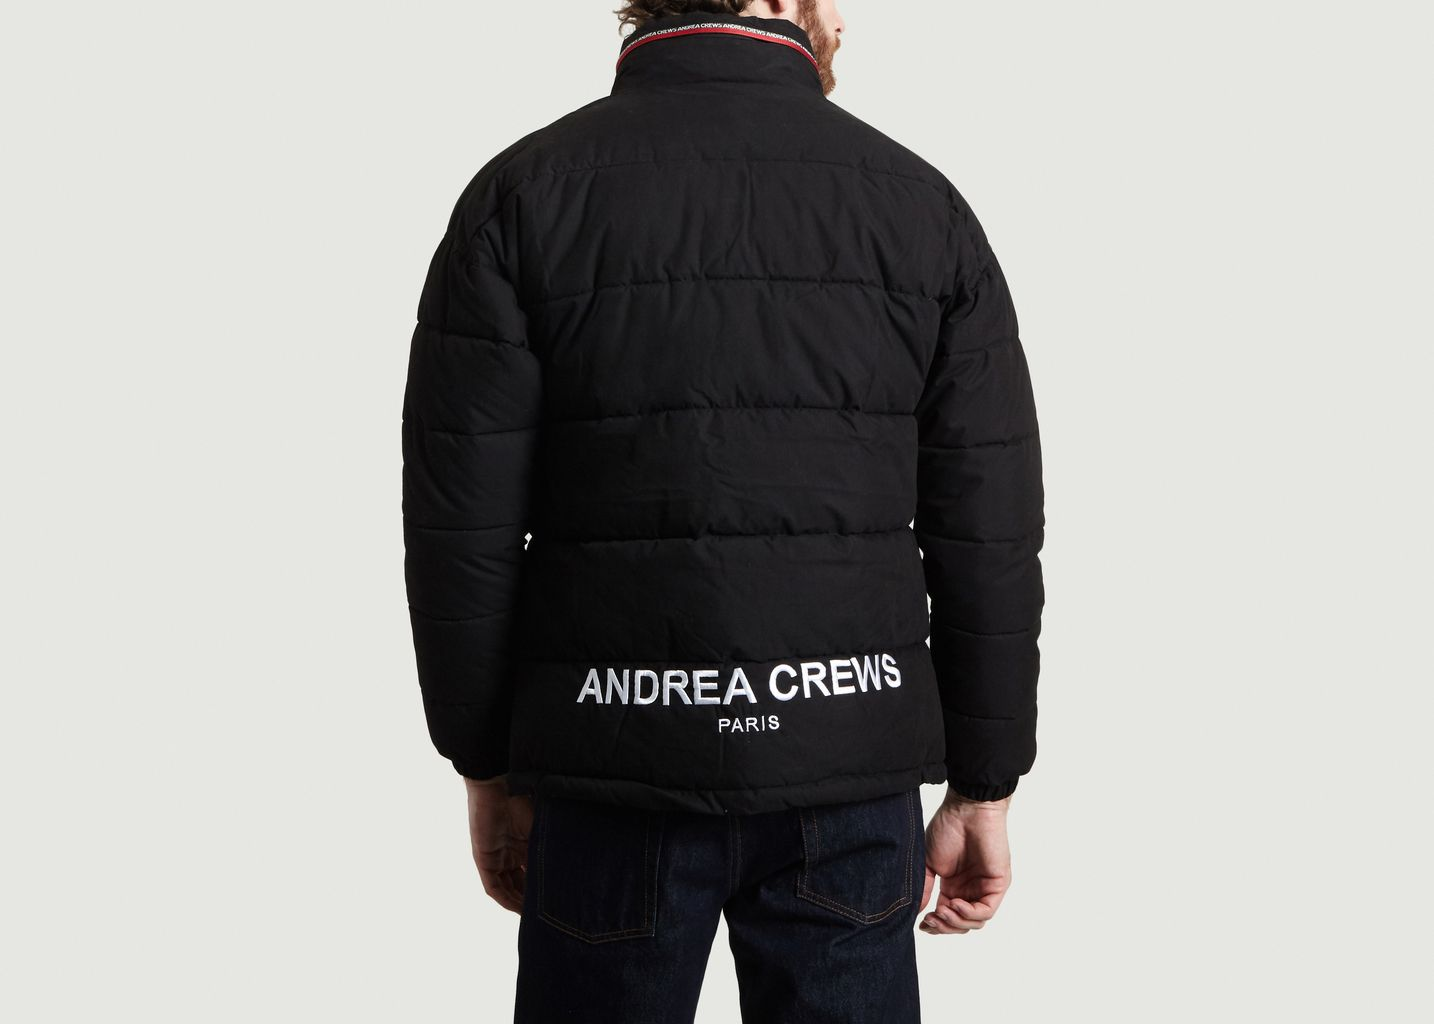 Doudoune Nebraska Andrea Crews x Schott Nebraska - Andrea Crews